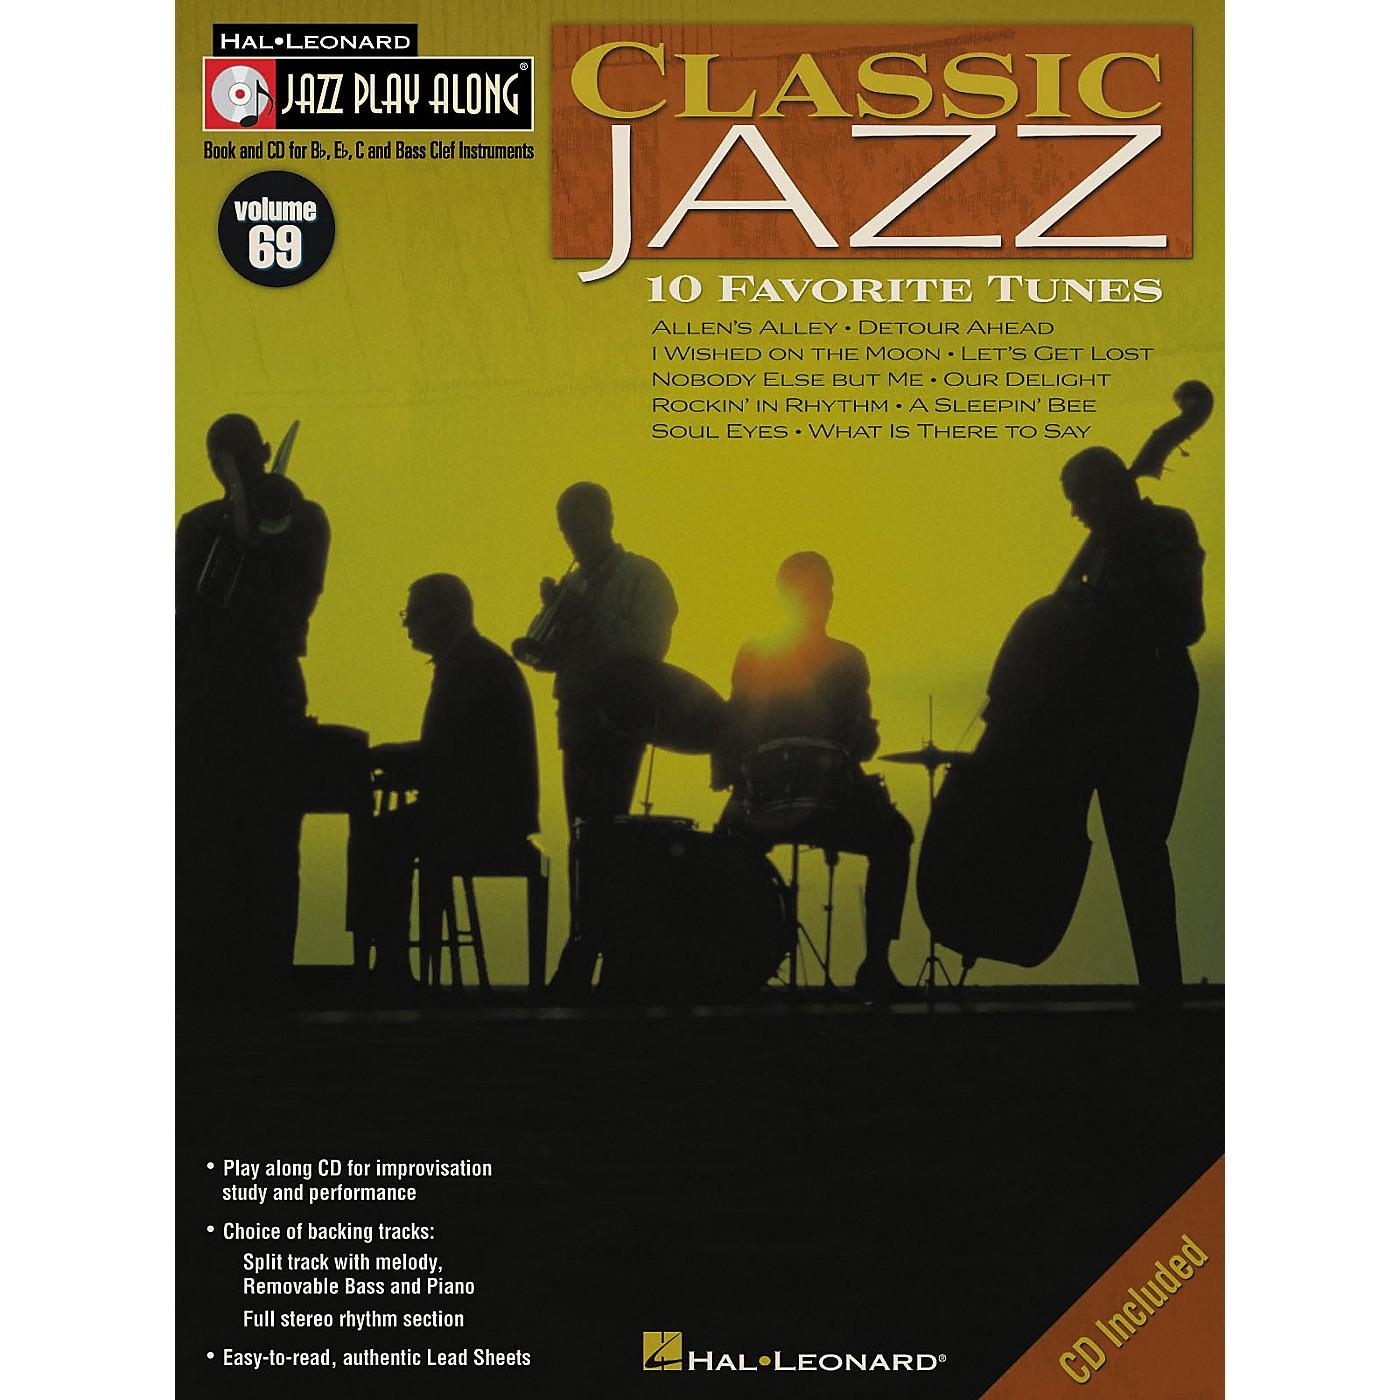 Hal Leonard Classic Jazz - Jazz Play Along Volume 69 Book with CD thumbnail